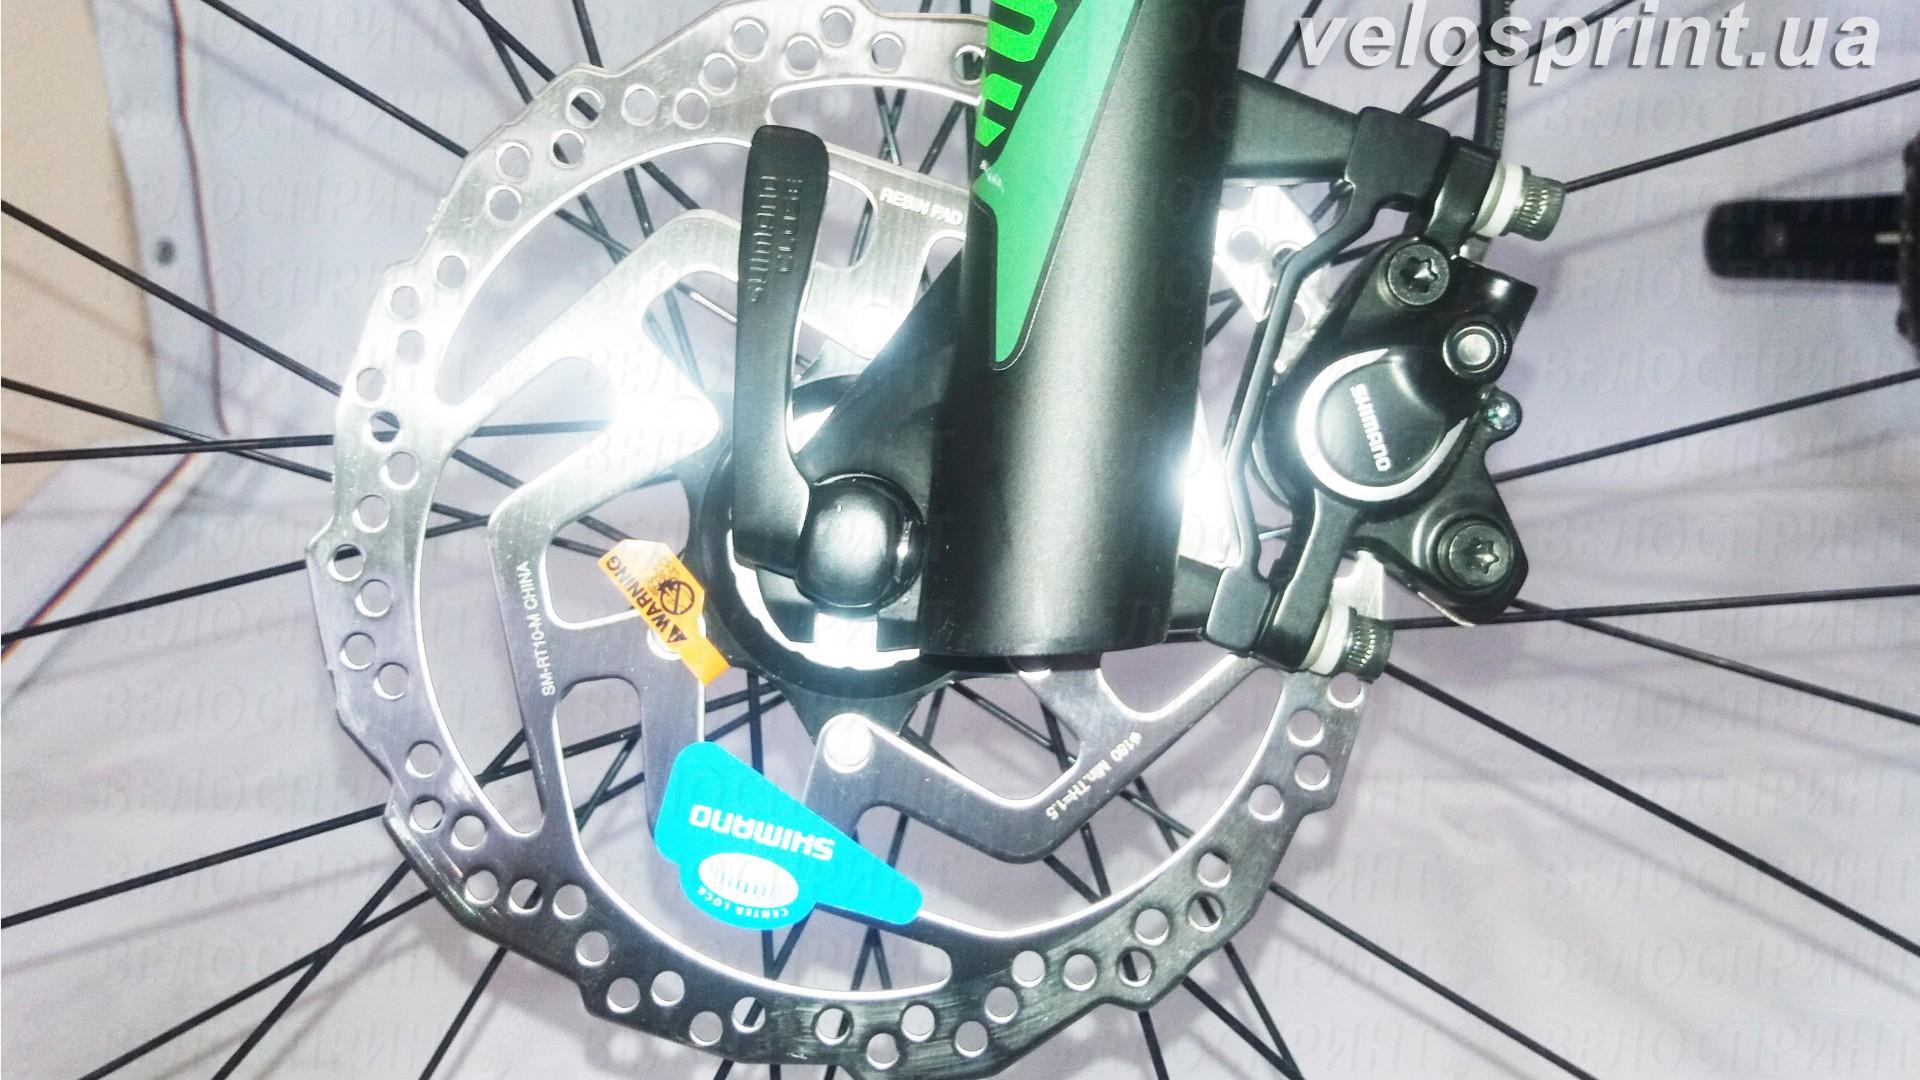 Велосипед GHOST Kato 7 AL 29 nightblack/riotgreen/neonred передний тормоз год 2017